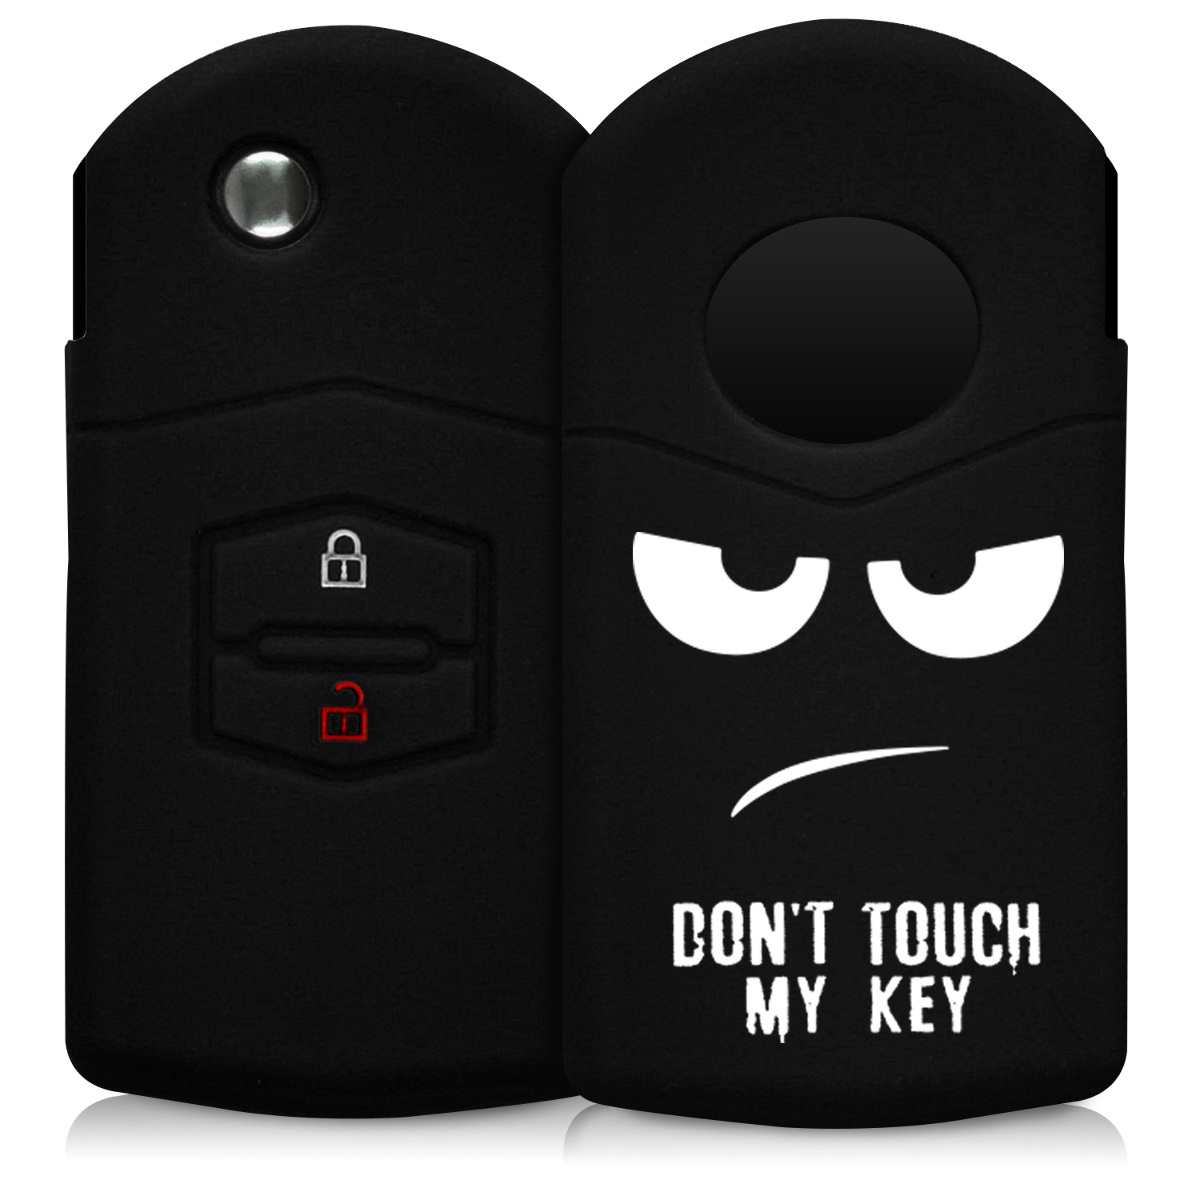 KW Θήκη Κλειδιού Mazda - Σιλικόνη - 2 Κουμπιά - White / Black (43812.01)